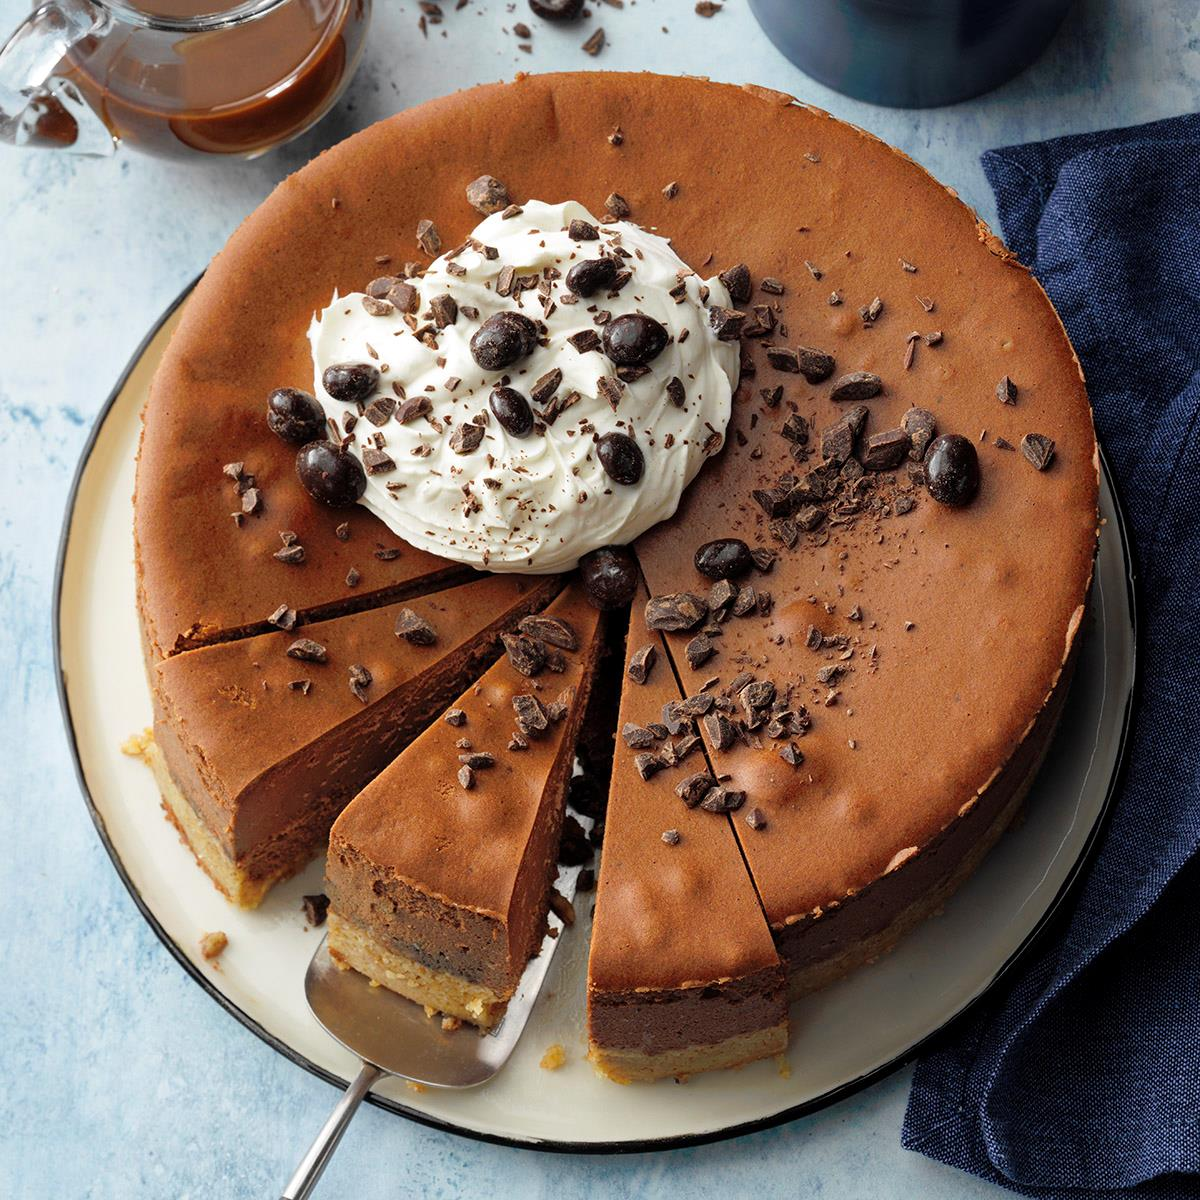 Double Chocolate Espresso Cheesecake Exps Toham21 49582 E11 18 7b 4